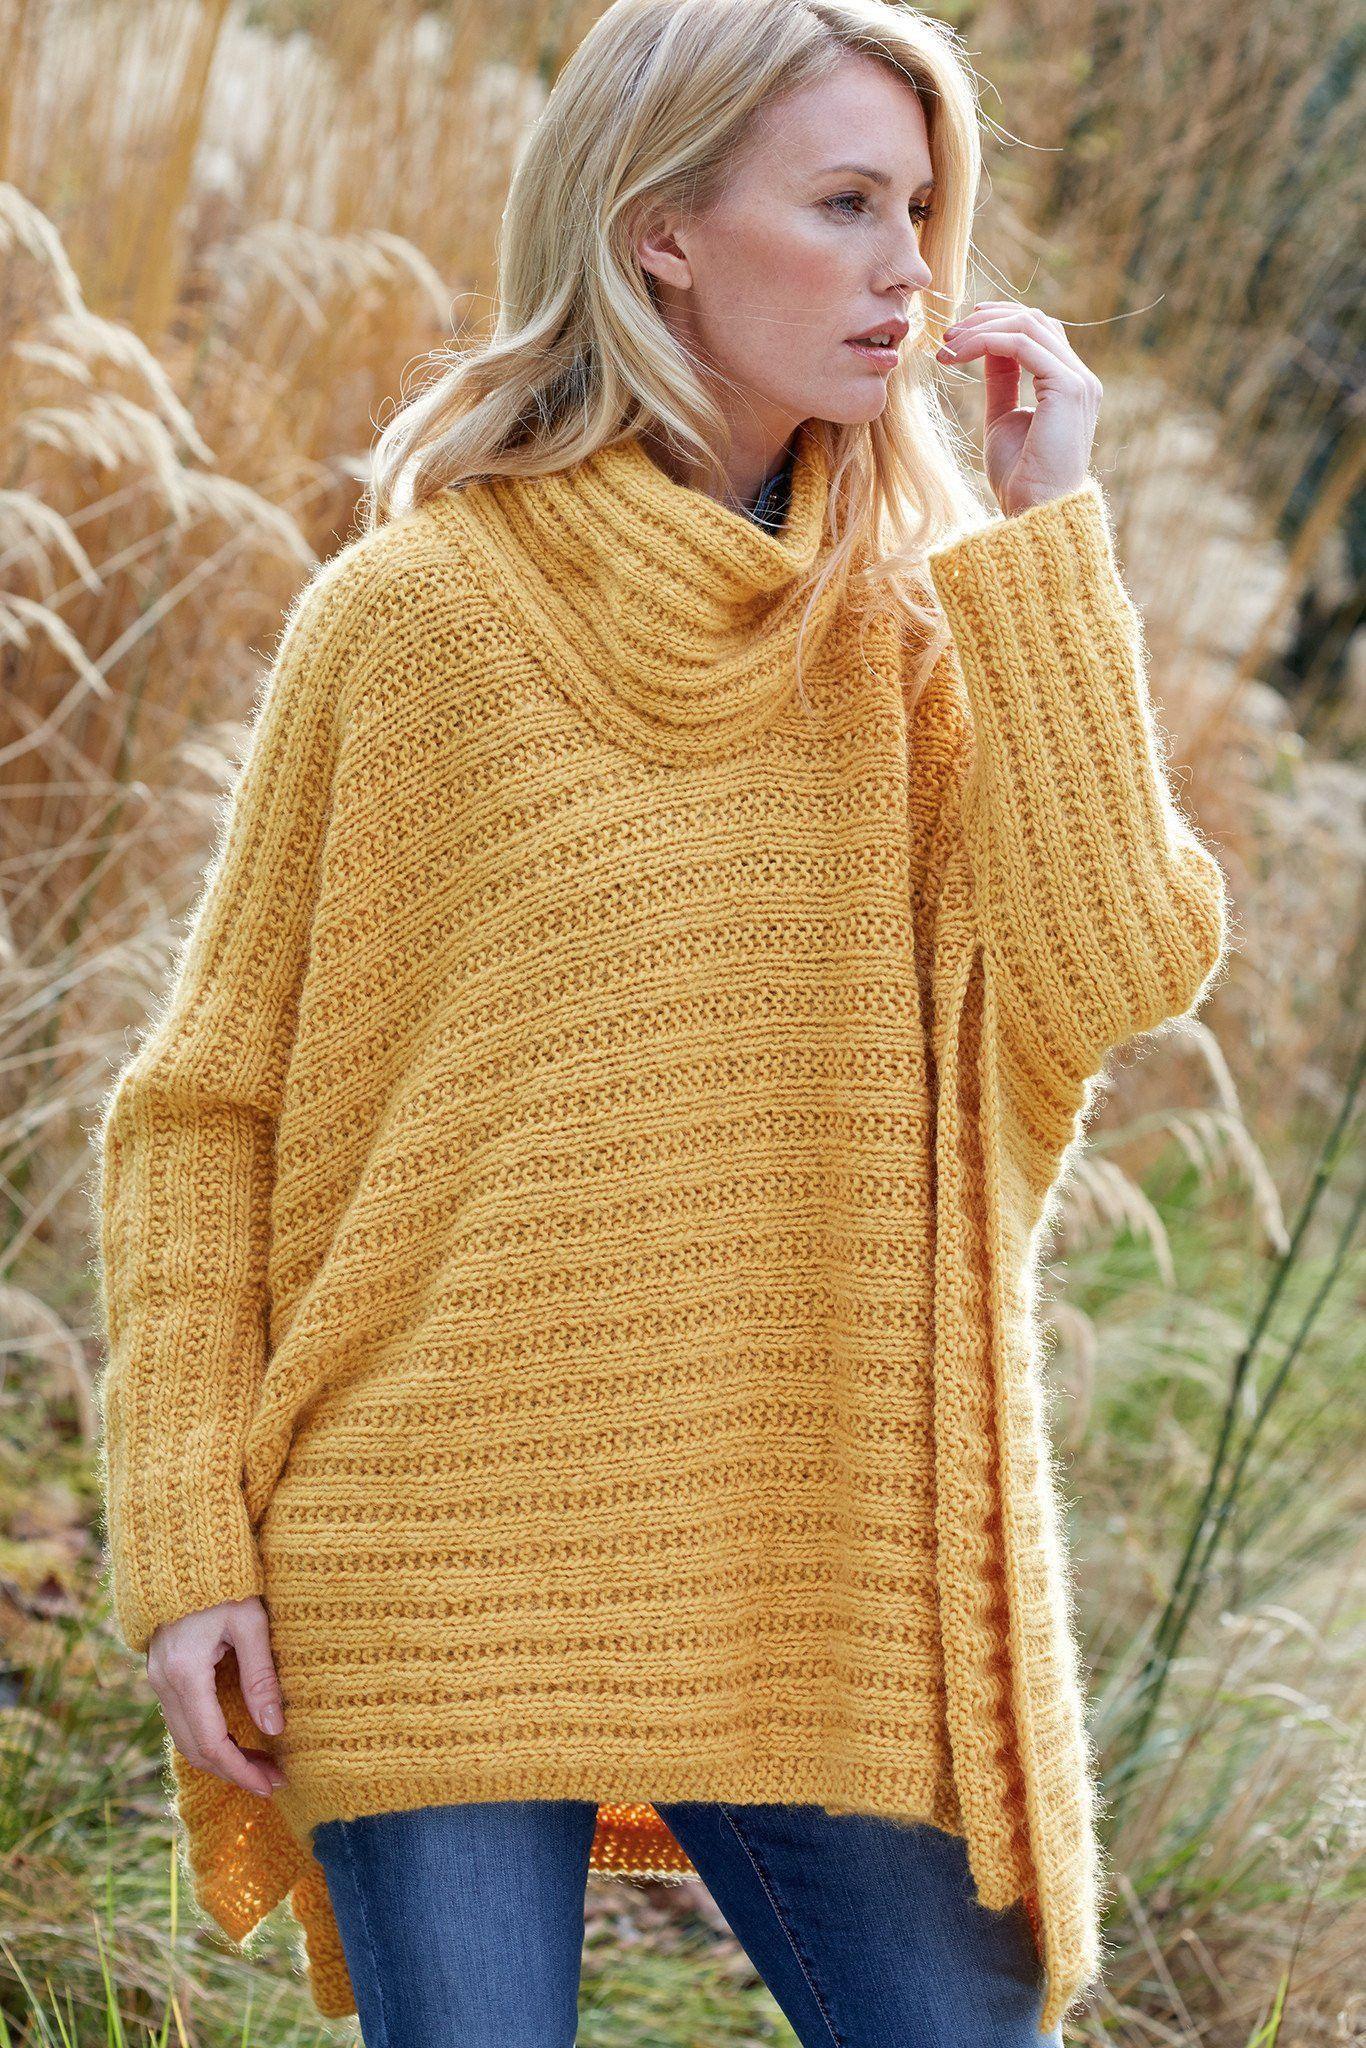 Womens Poncho Jumper Knitting Pattern | The Knitting Network